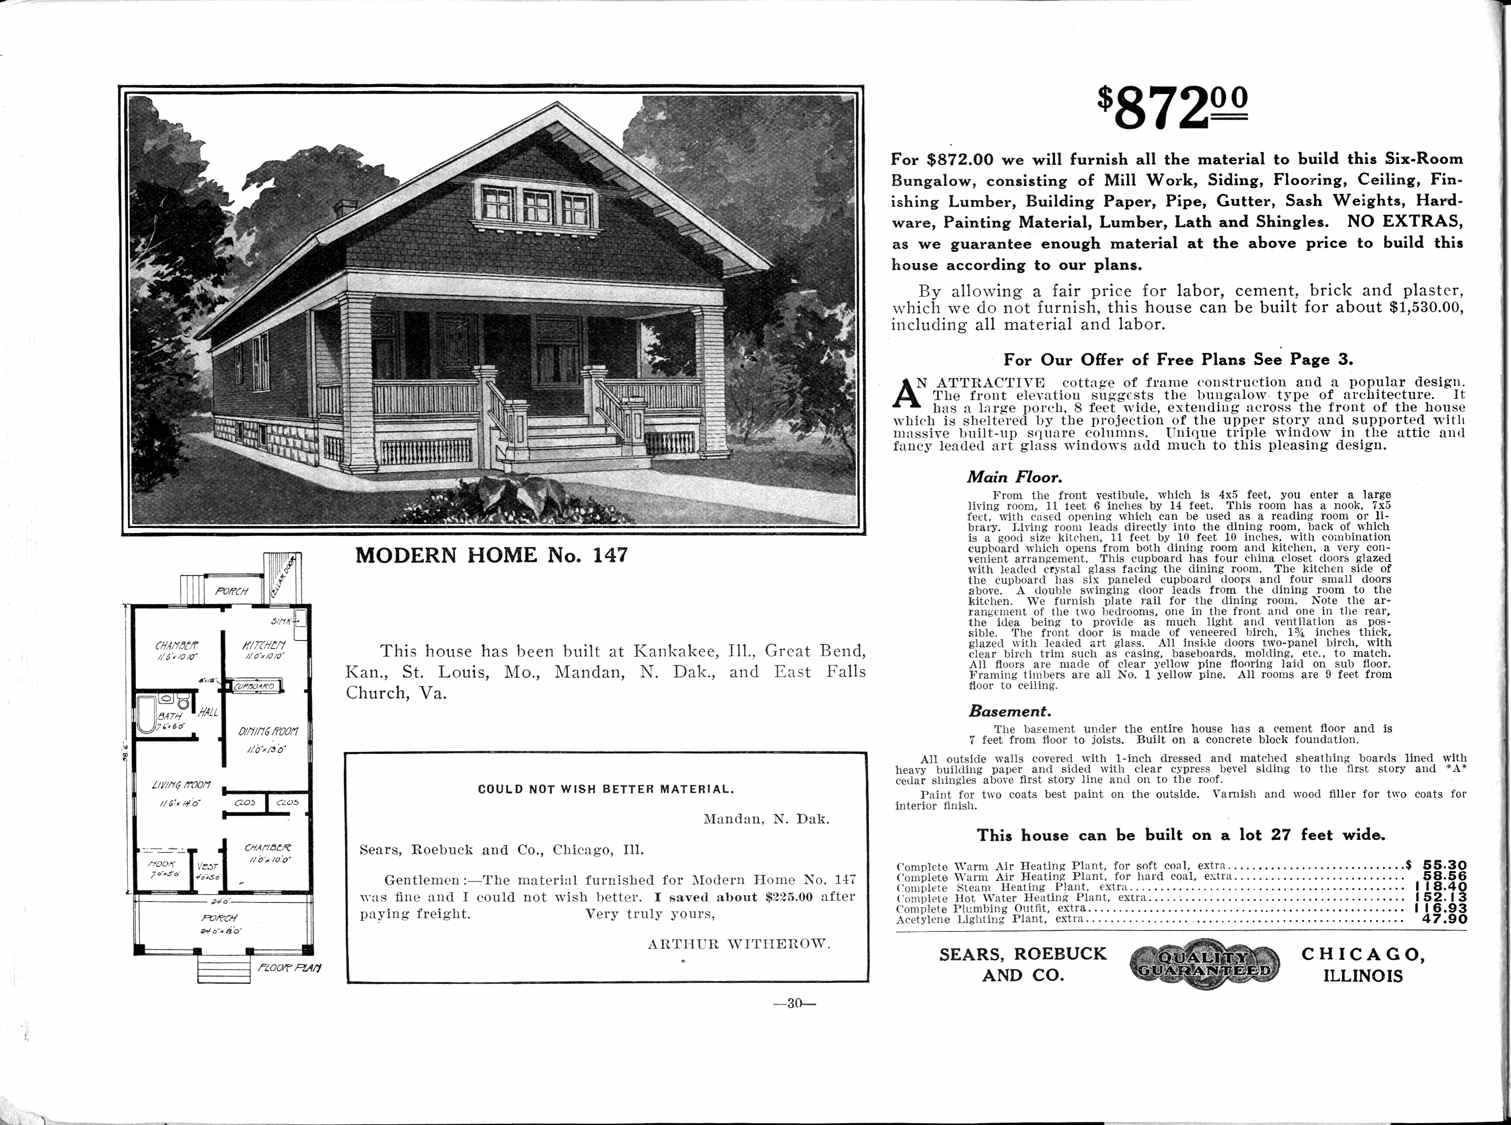 Noble Pursuits Circa 1920 Floor Plans